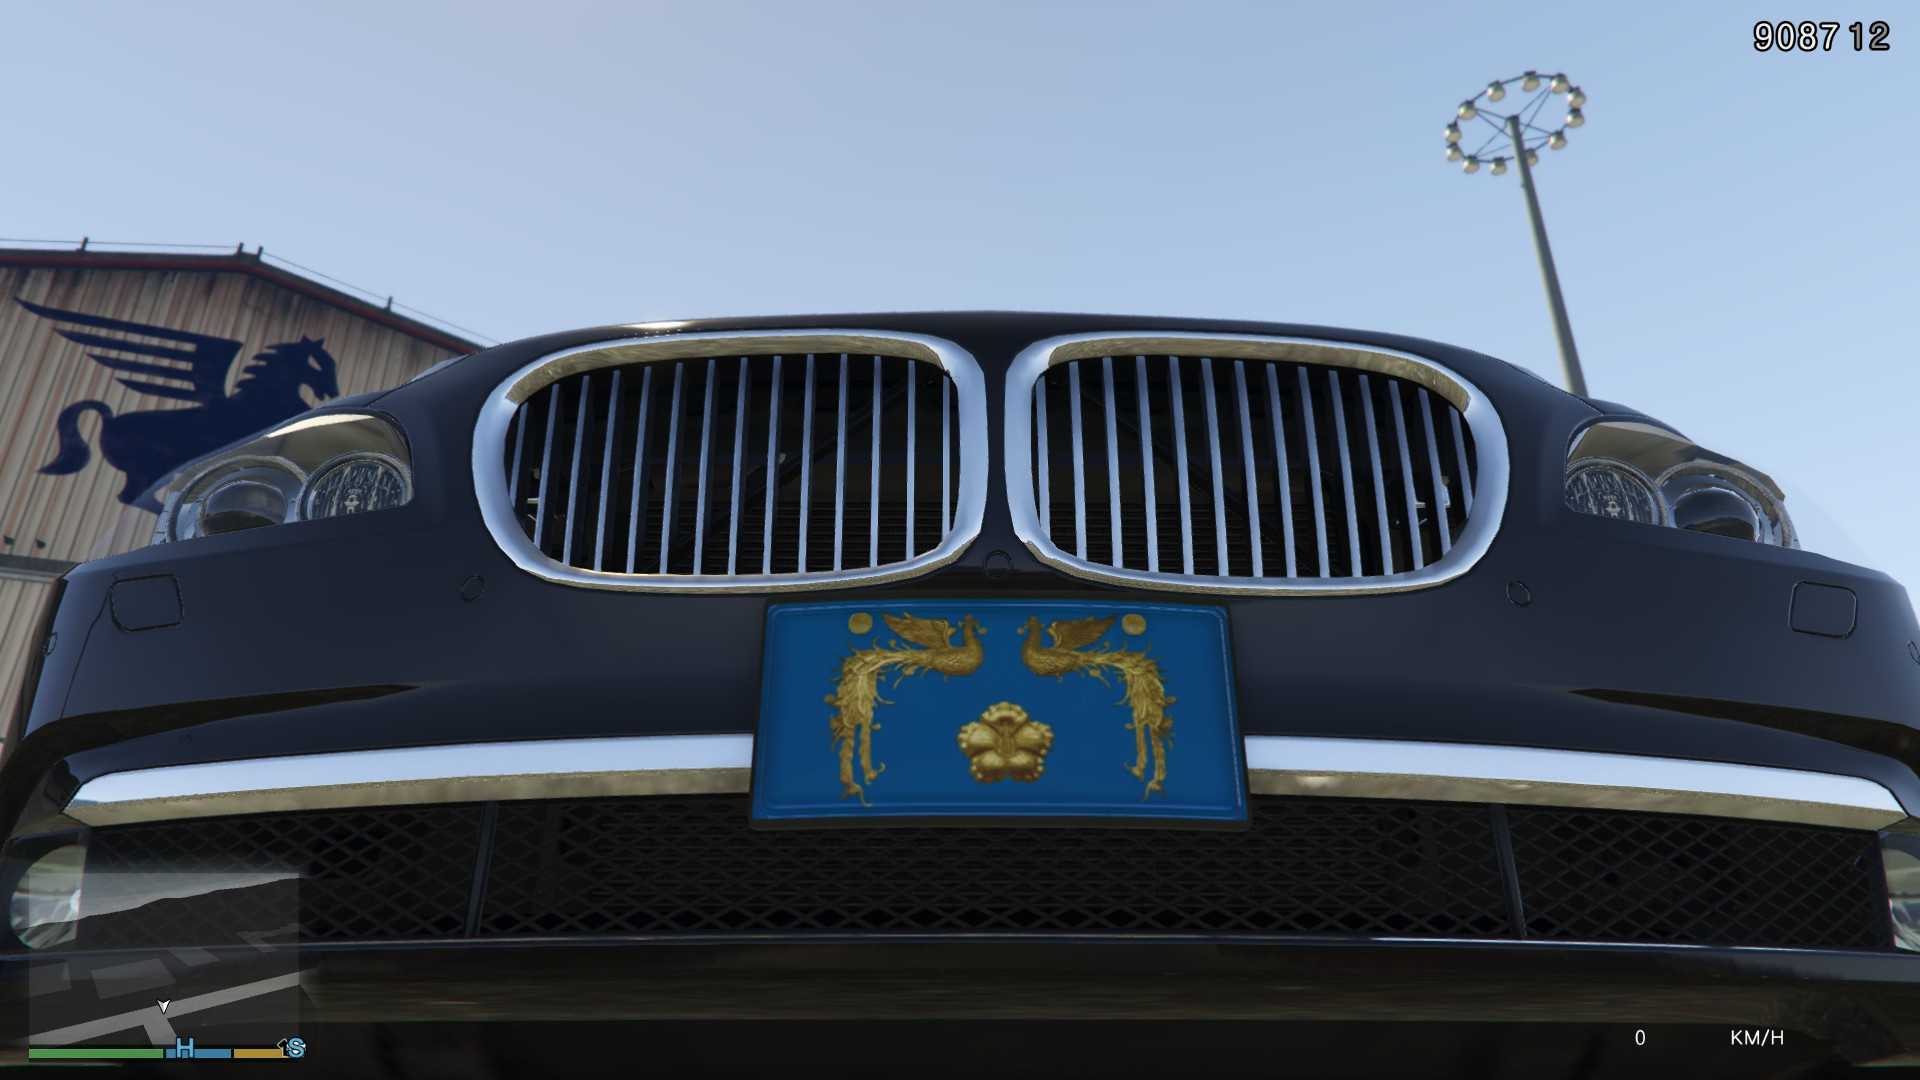 South Korea President Car Number Plate